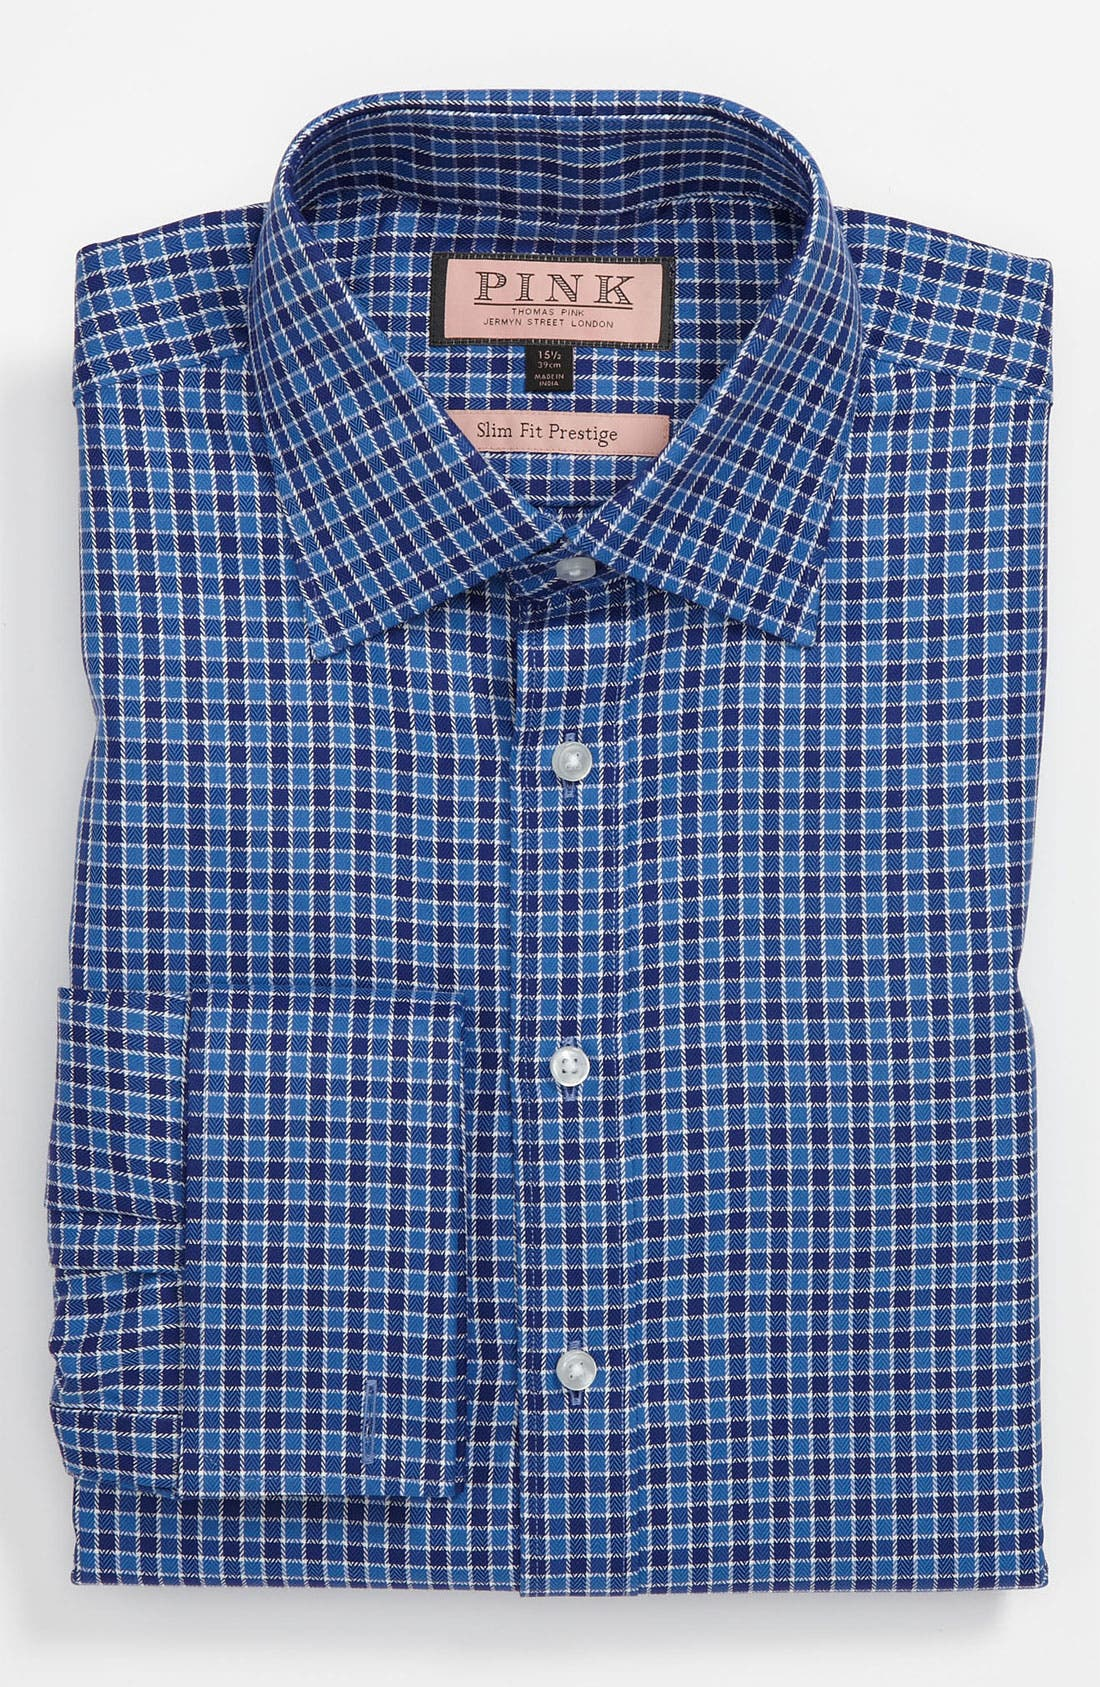 Main Image - Thomas Pink Slim Fit Prestige Dress Shirt